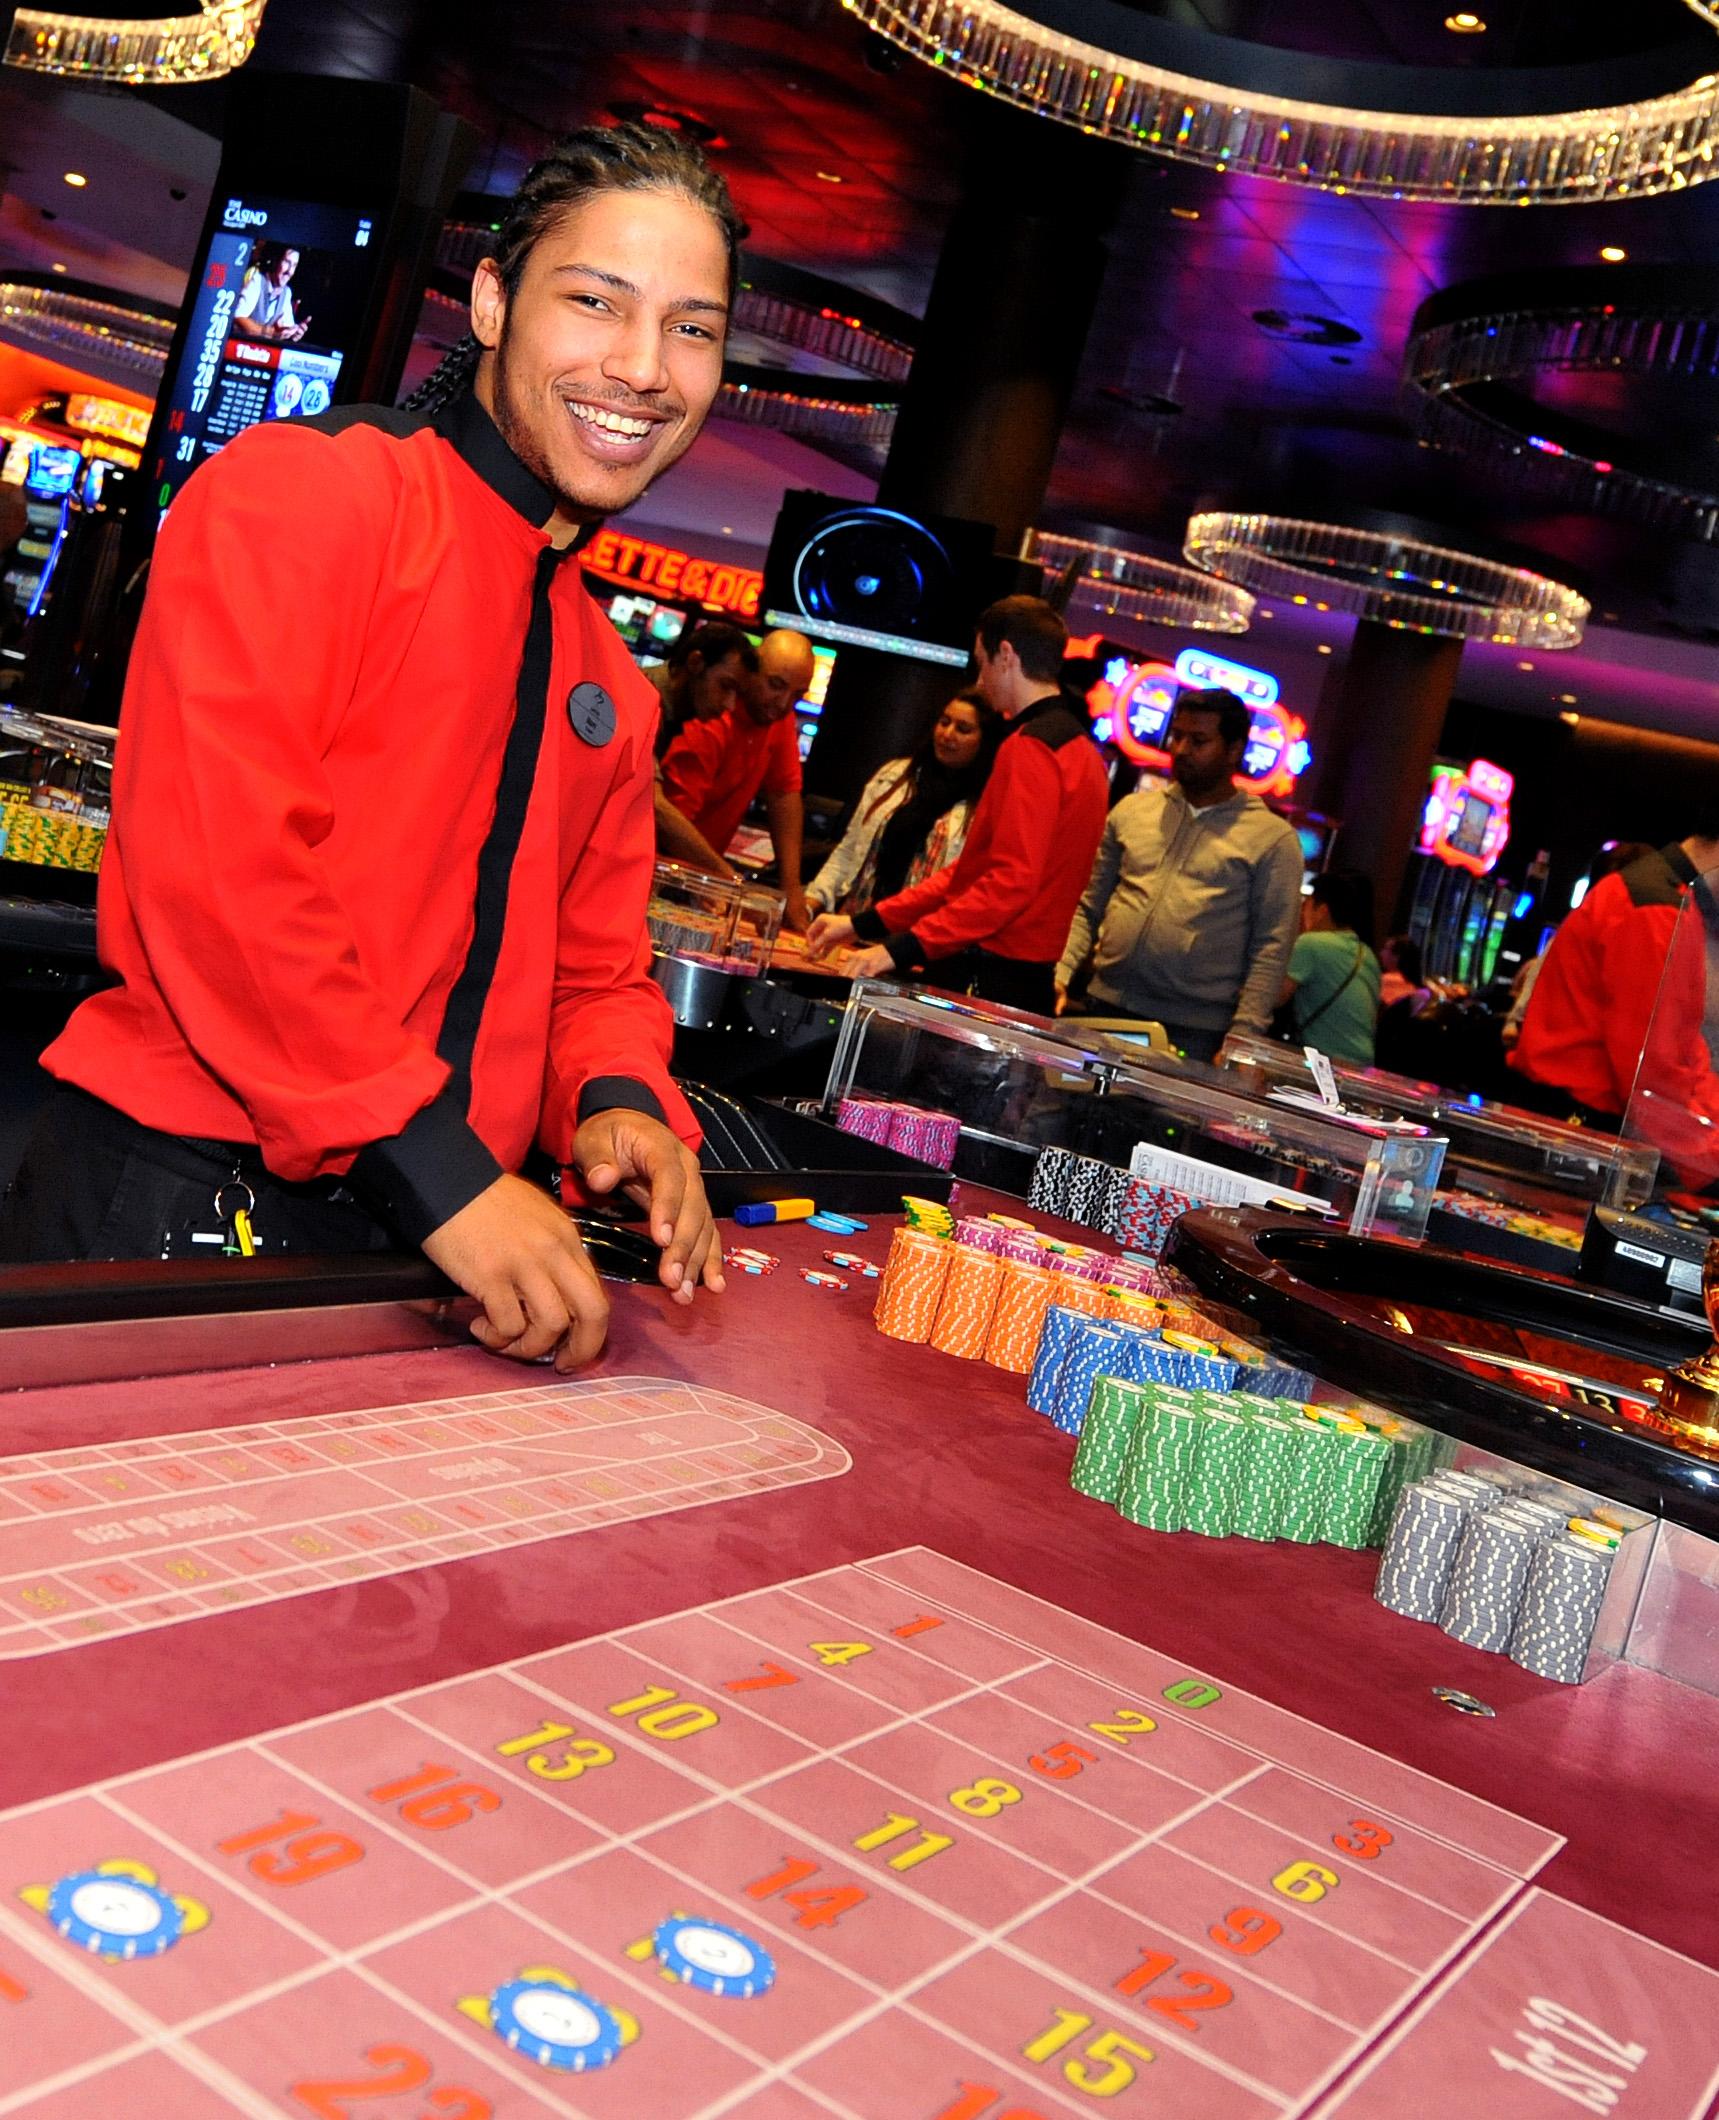 Big casino uk win comache nation casino